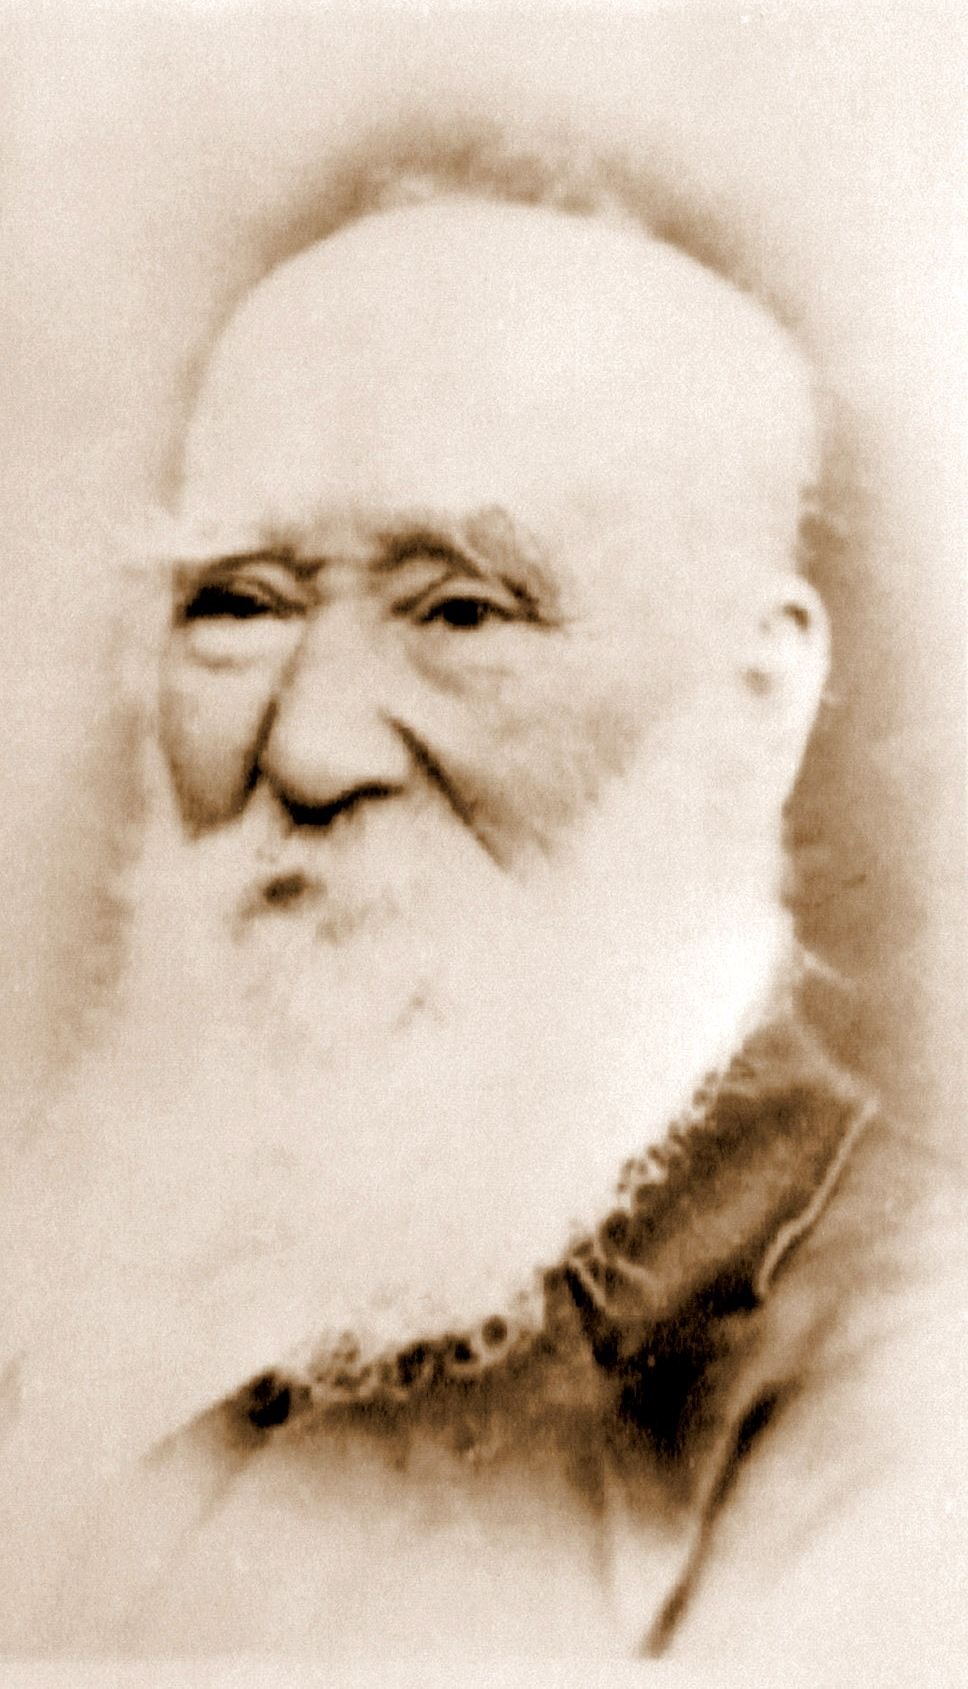 Bird, Edmund Fuller